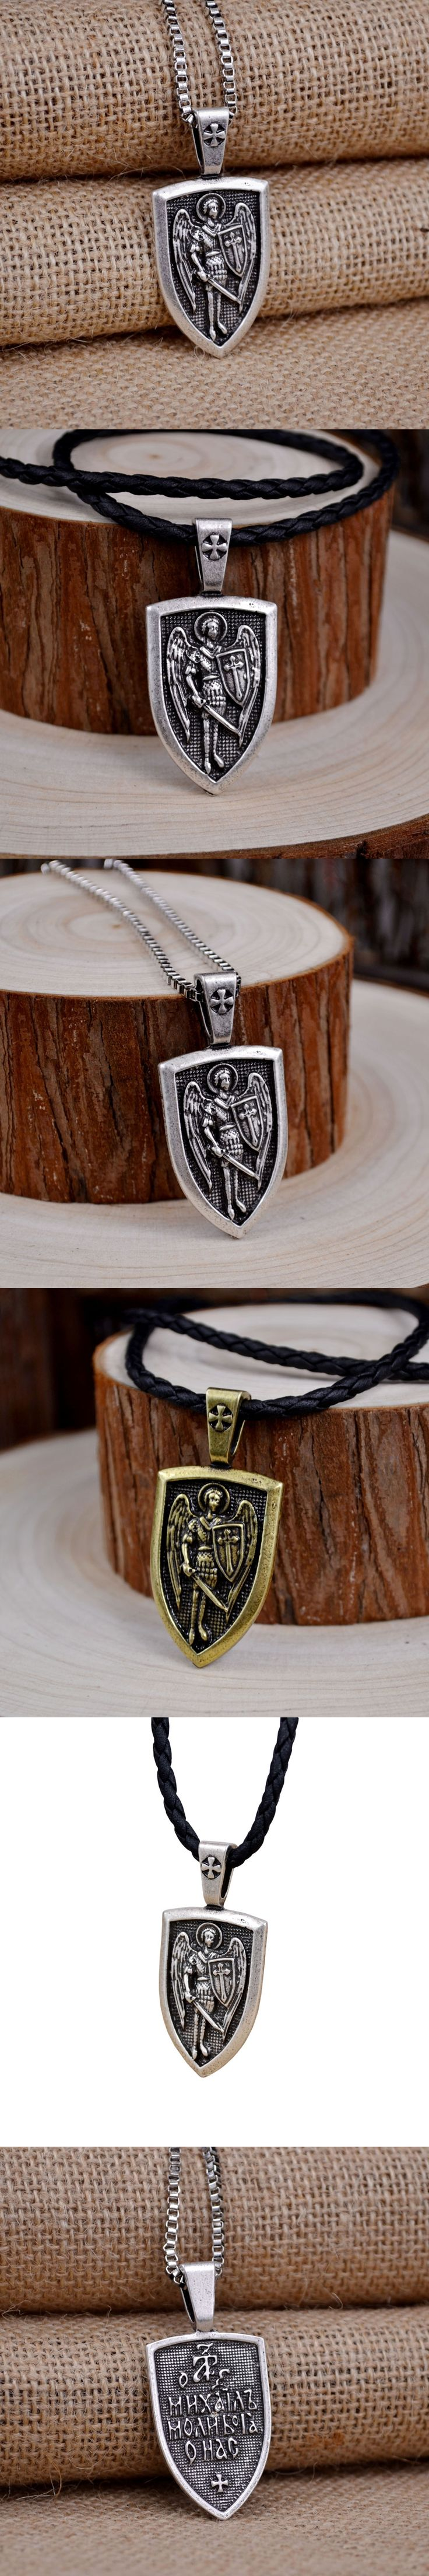 Men Necklace Archangel St.Michael Protect Me Saint Shield Protection Charm Russian Orhodox Pendant Necklace